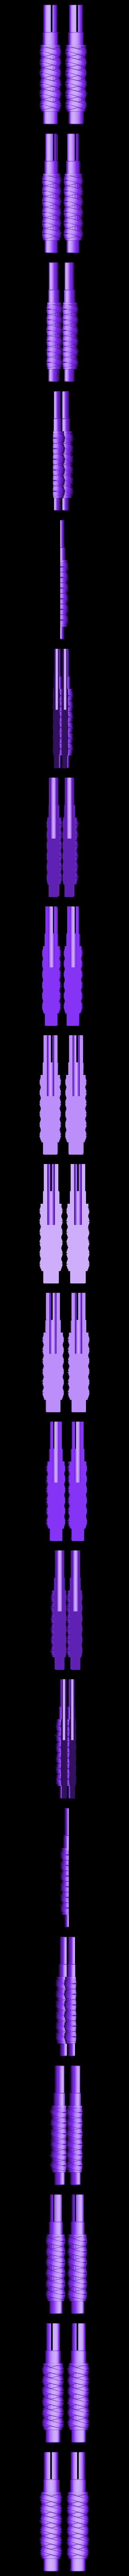 Gruffsbane_Handle_Halves_dowel_rod.stl Download free STL file Gruffsbane Sword • 3D printer design, mrhers2